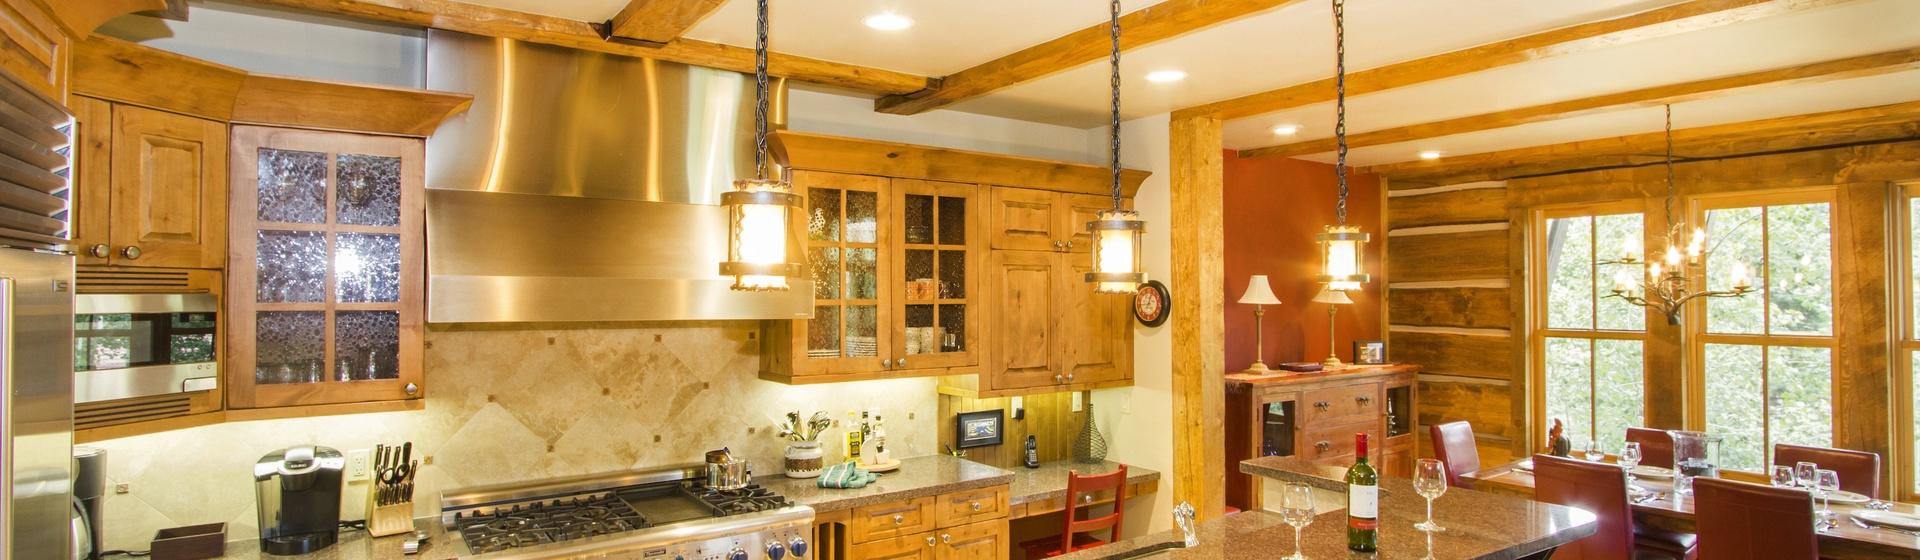 5-MountainVillage-ElkstonePlace1-Kitchen-Web.jpg